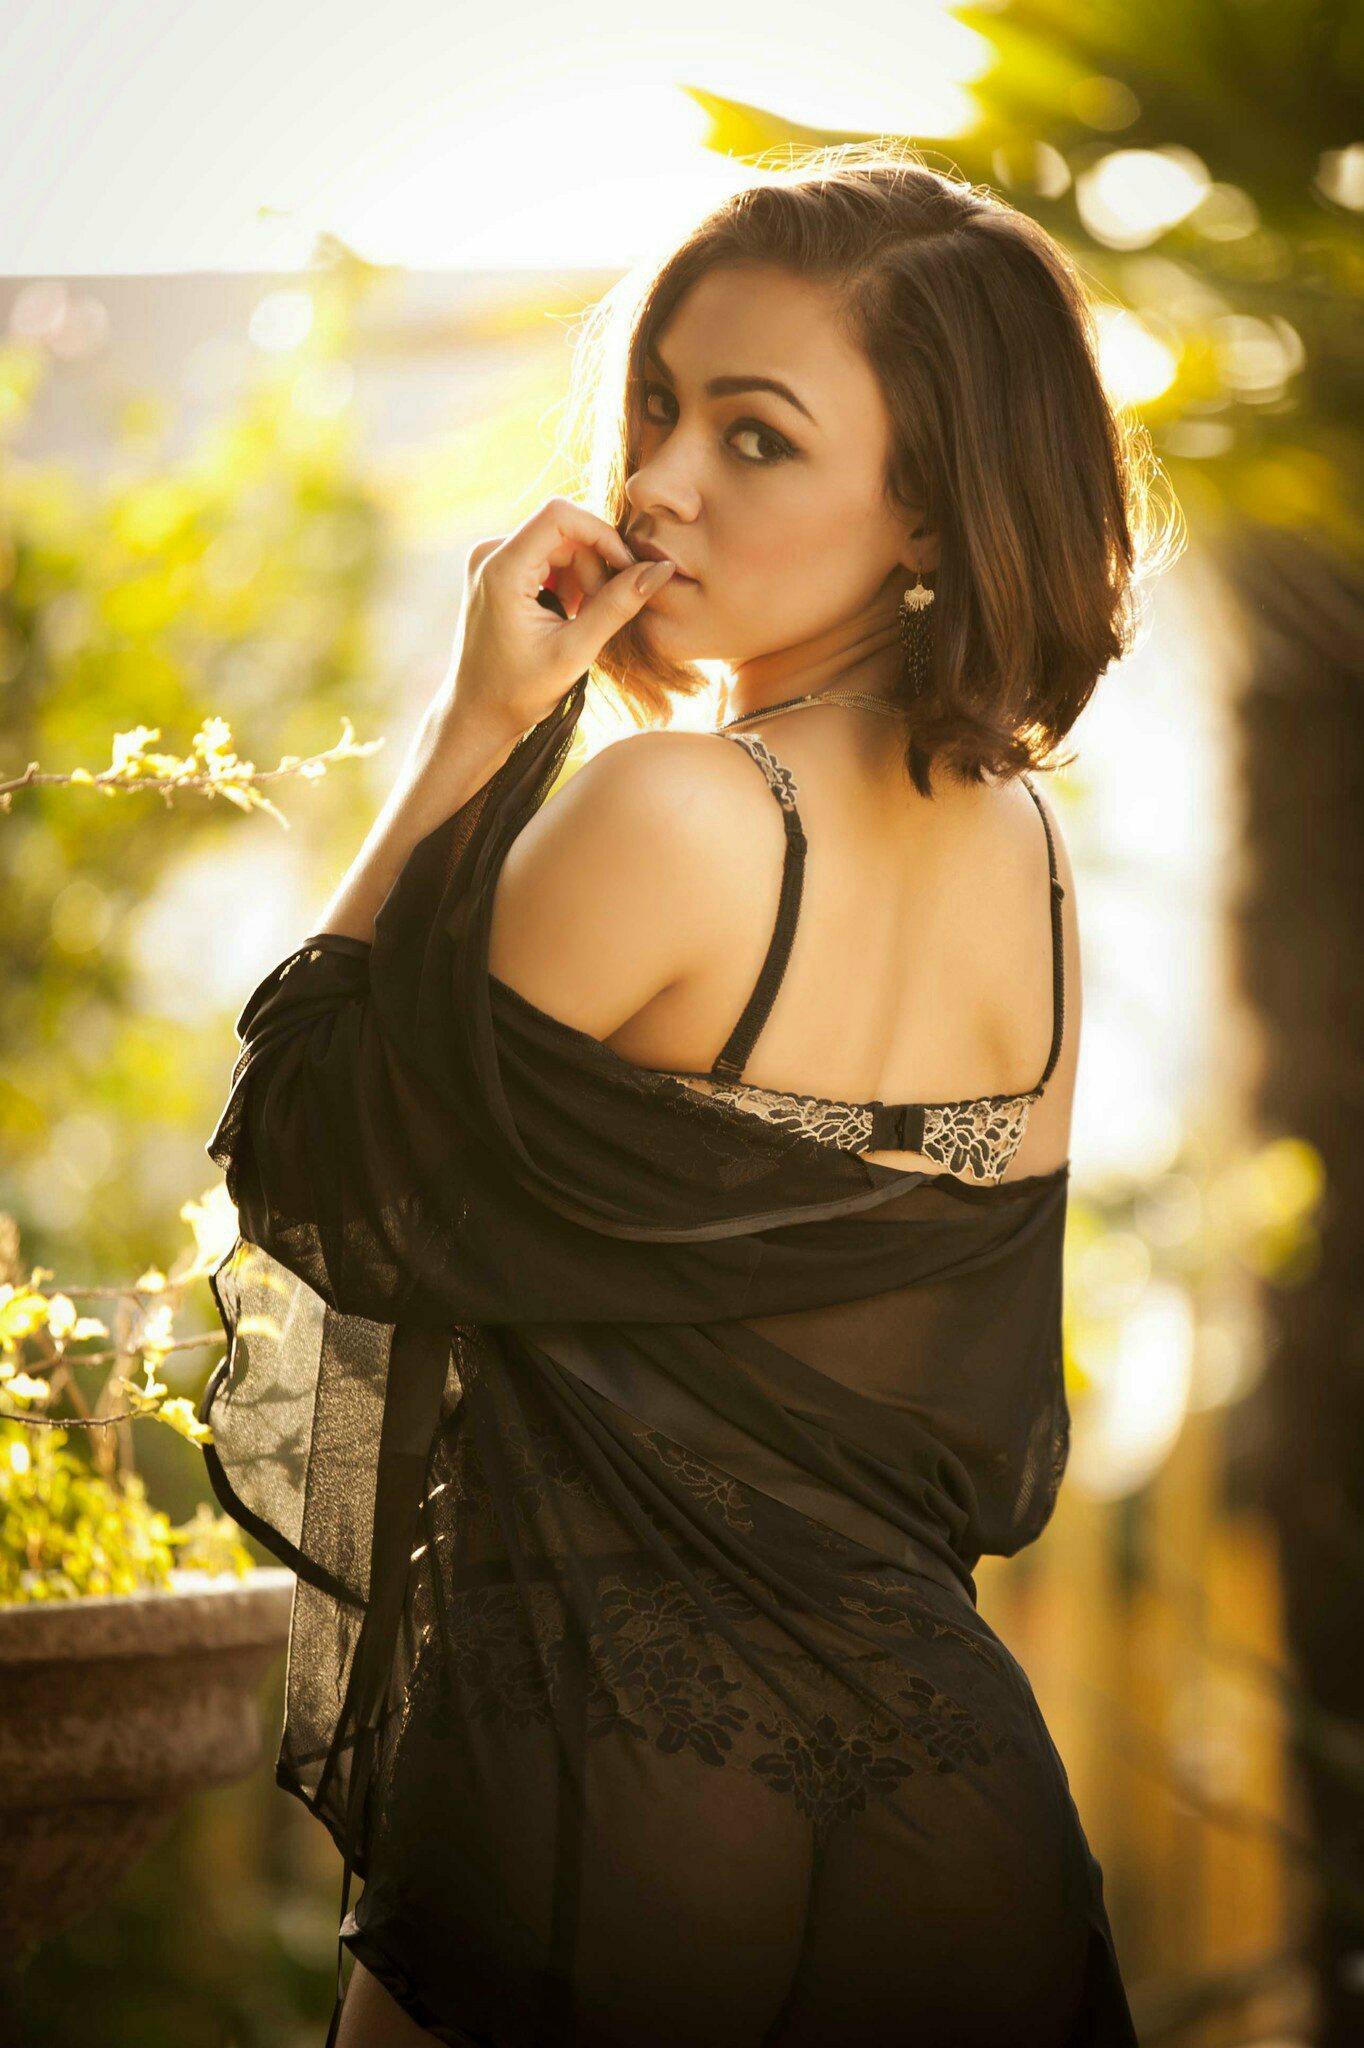 SHAWNIE RAFINER - Model/ Actress/SpokesModel